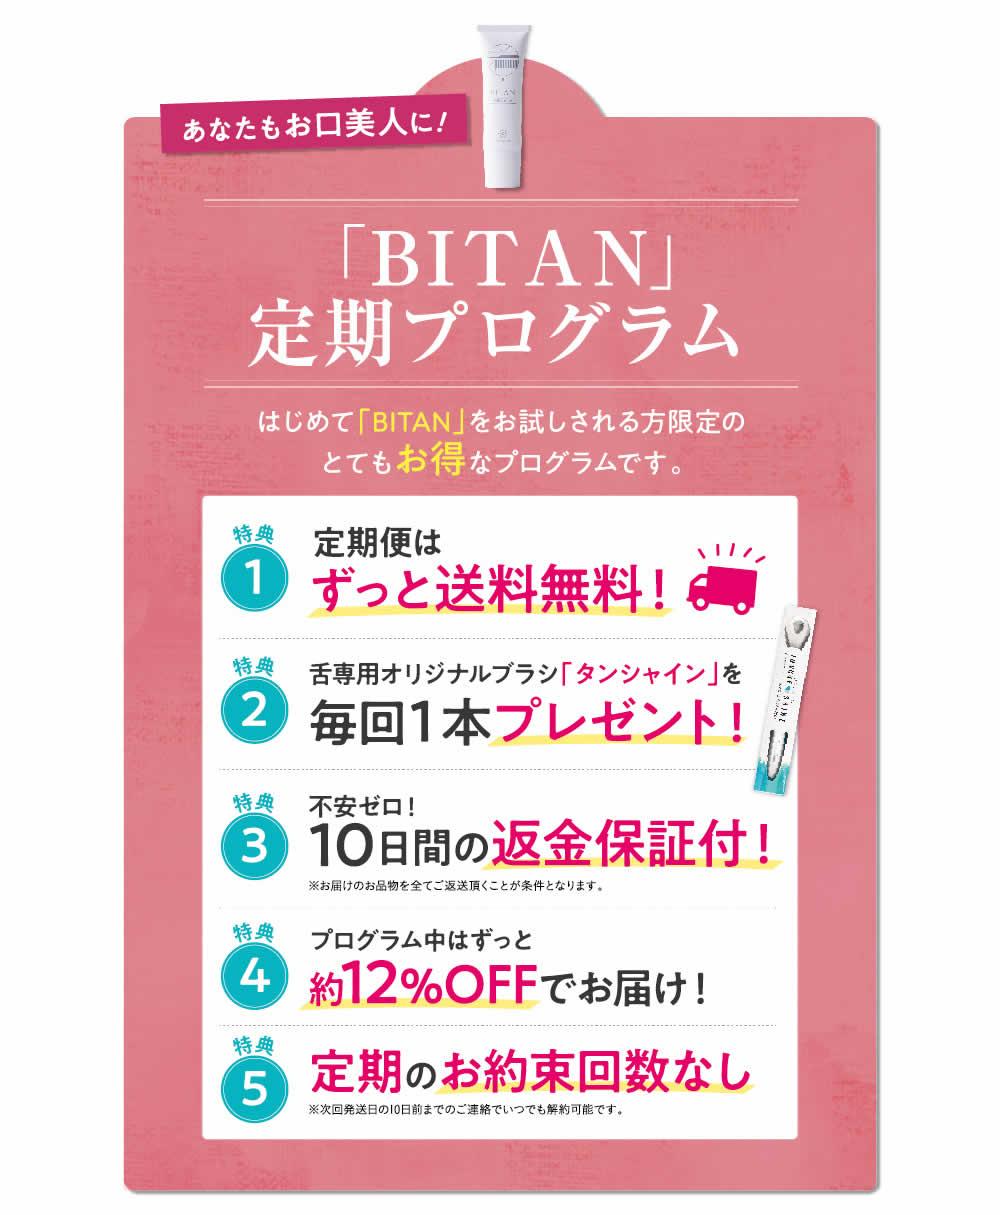 BITAN(ビタン)定期プログラム